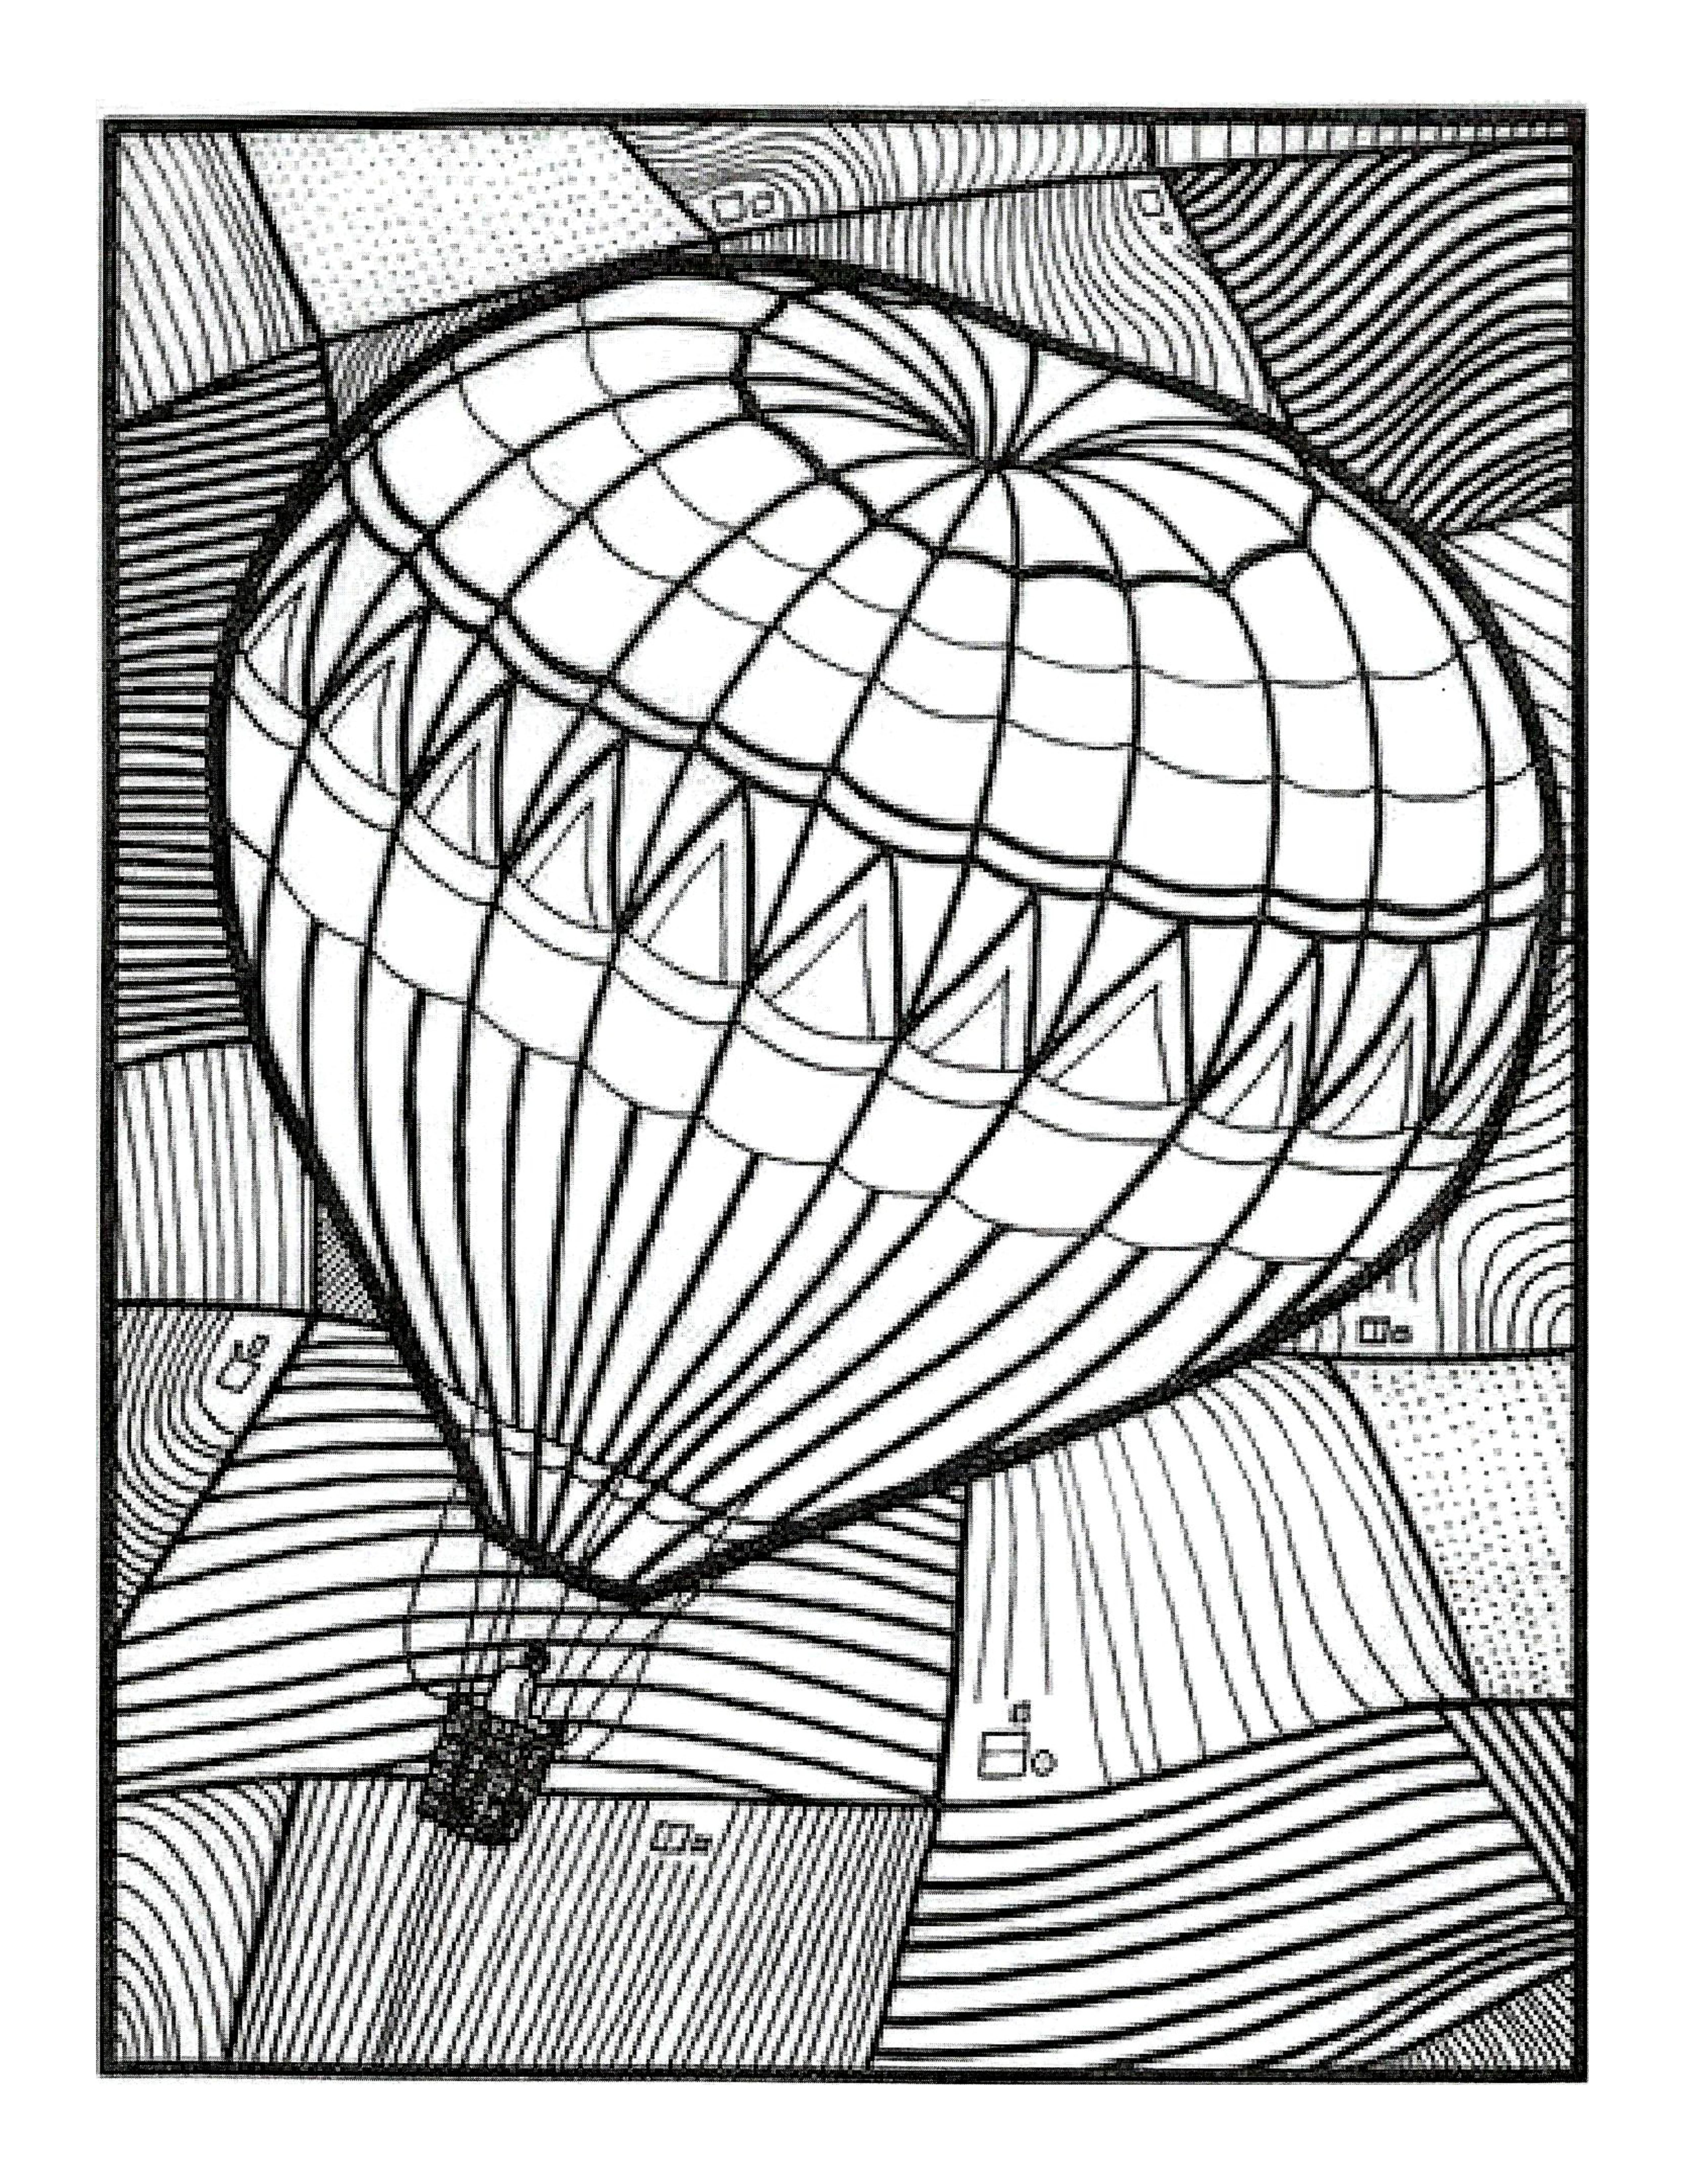 18 LET'S DOODLE Coloring Pages ideas   doodle coloring, coloring ...